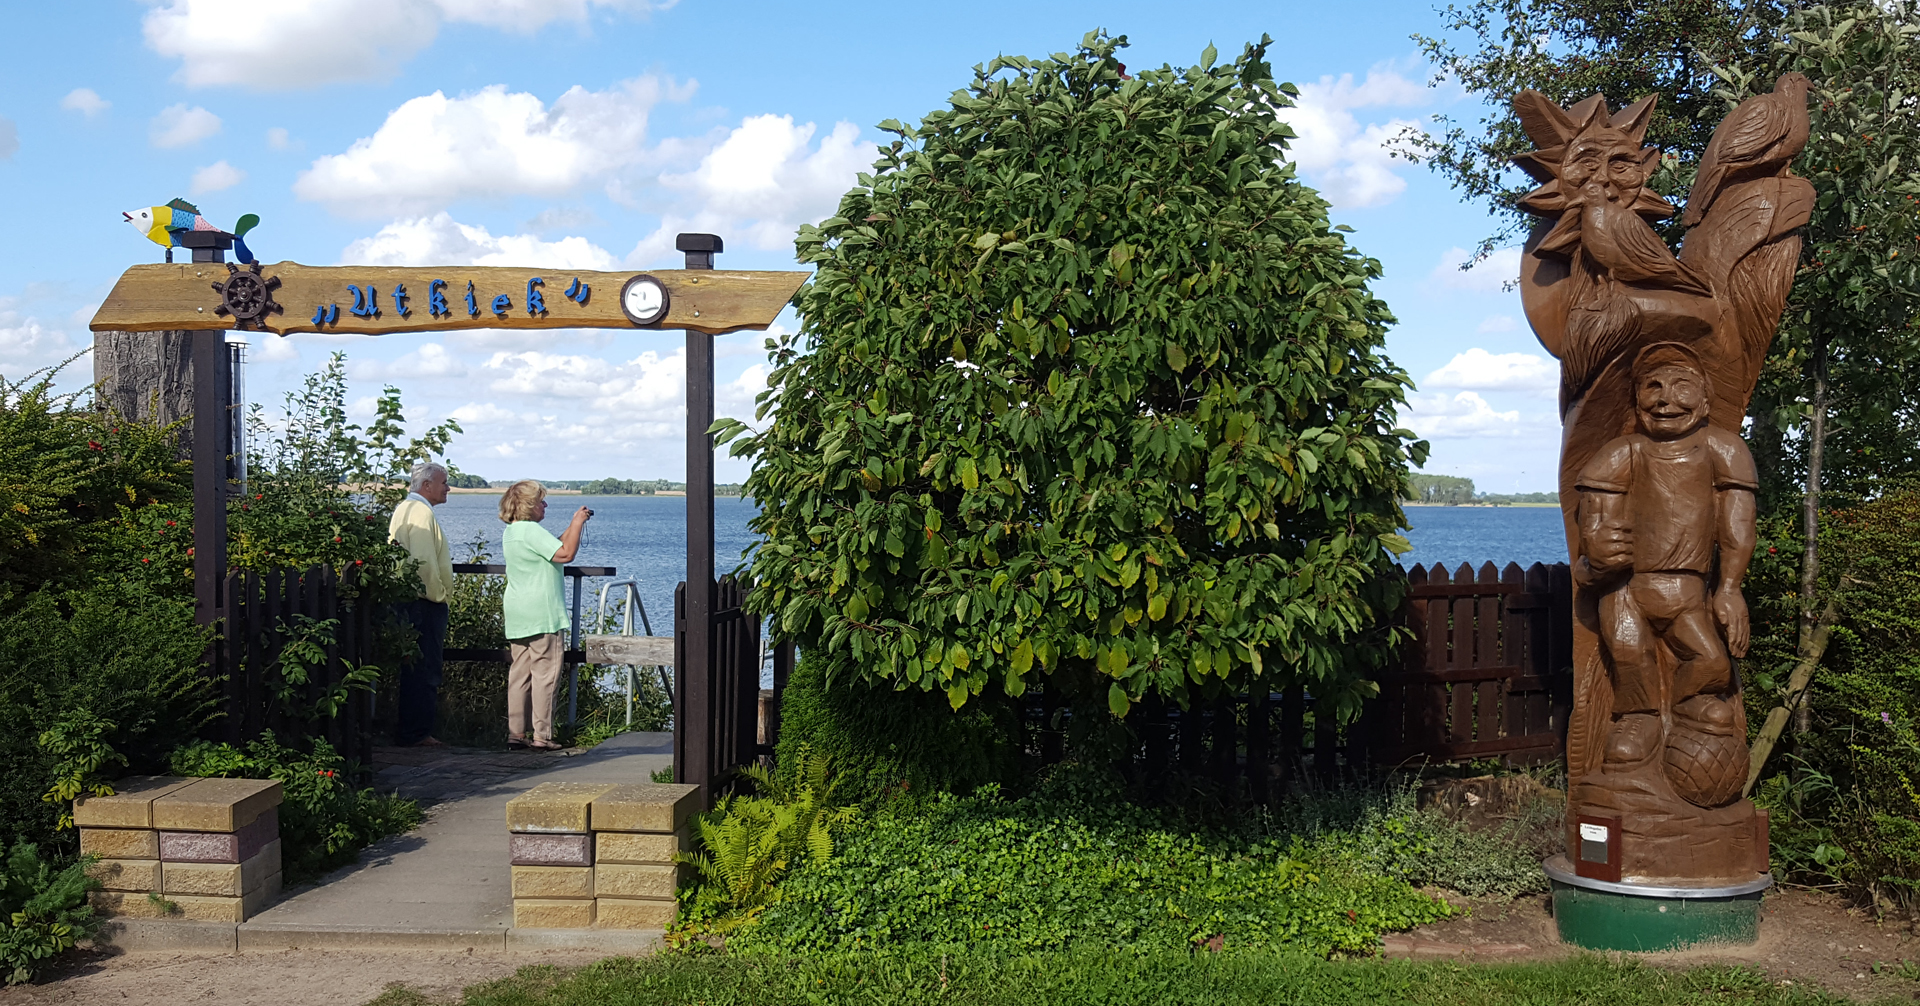 Utkiek am Strelasund